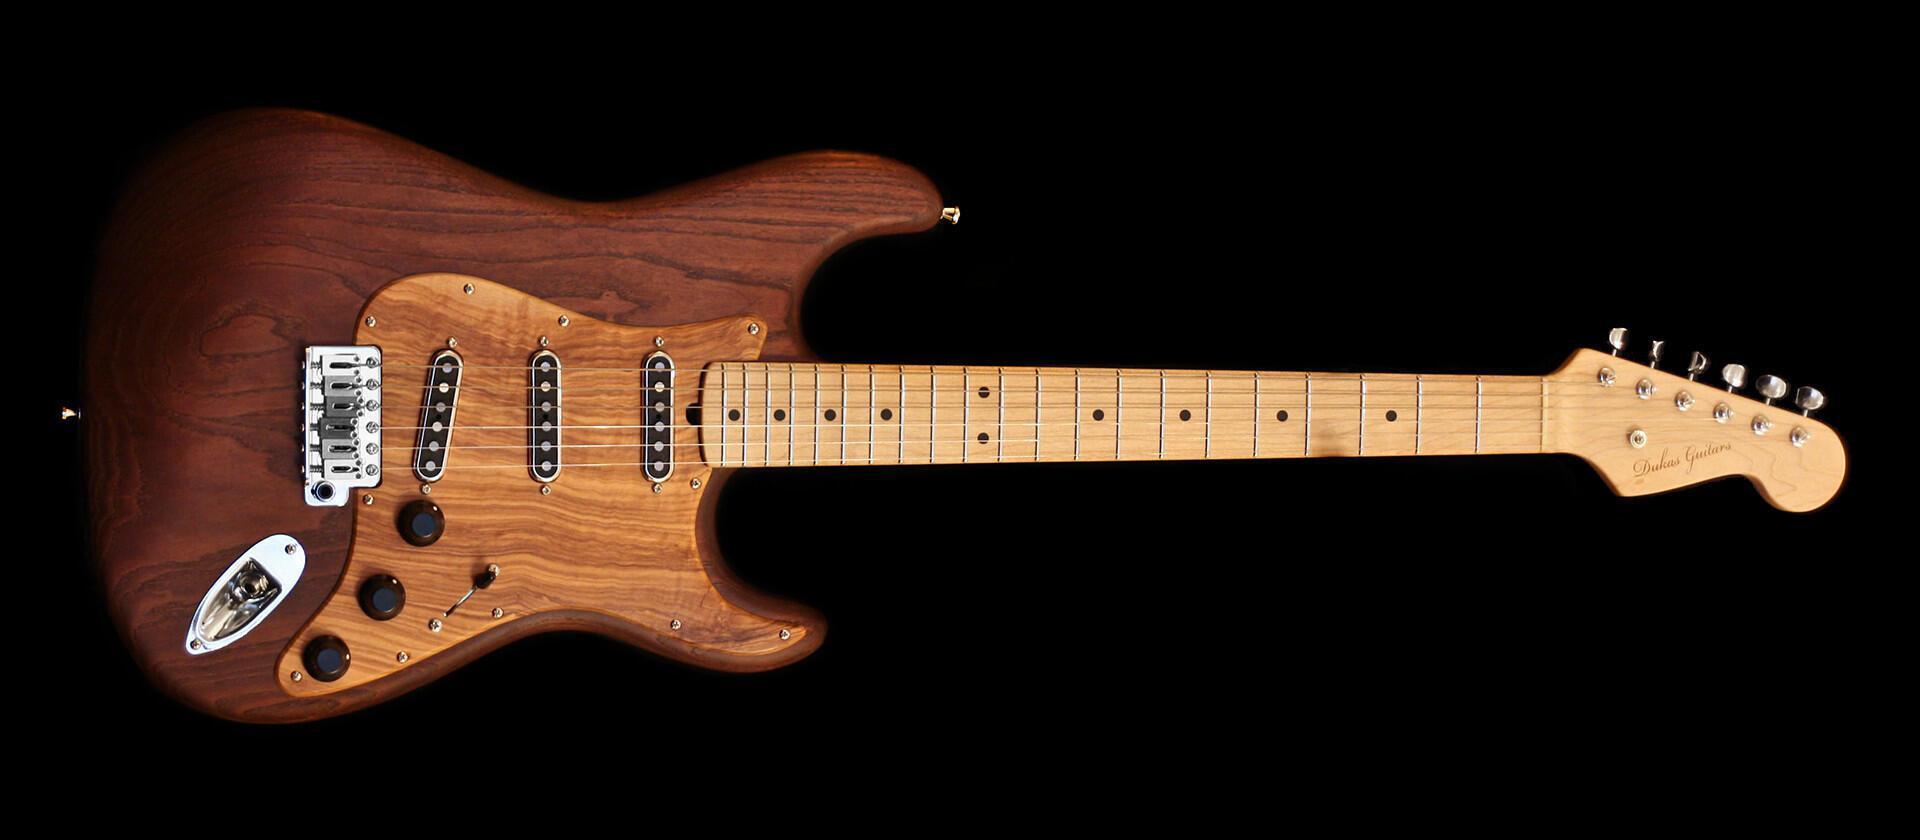 Dukas Guitars S model